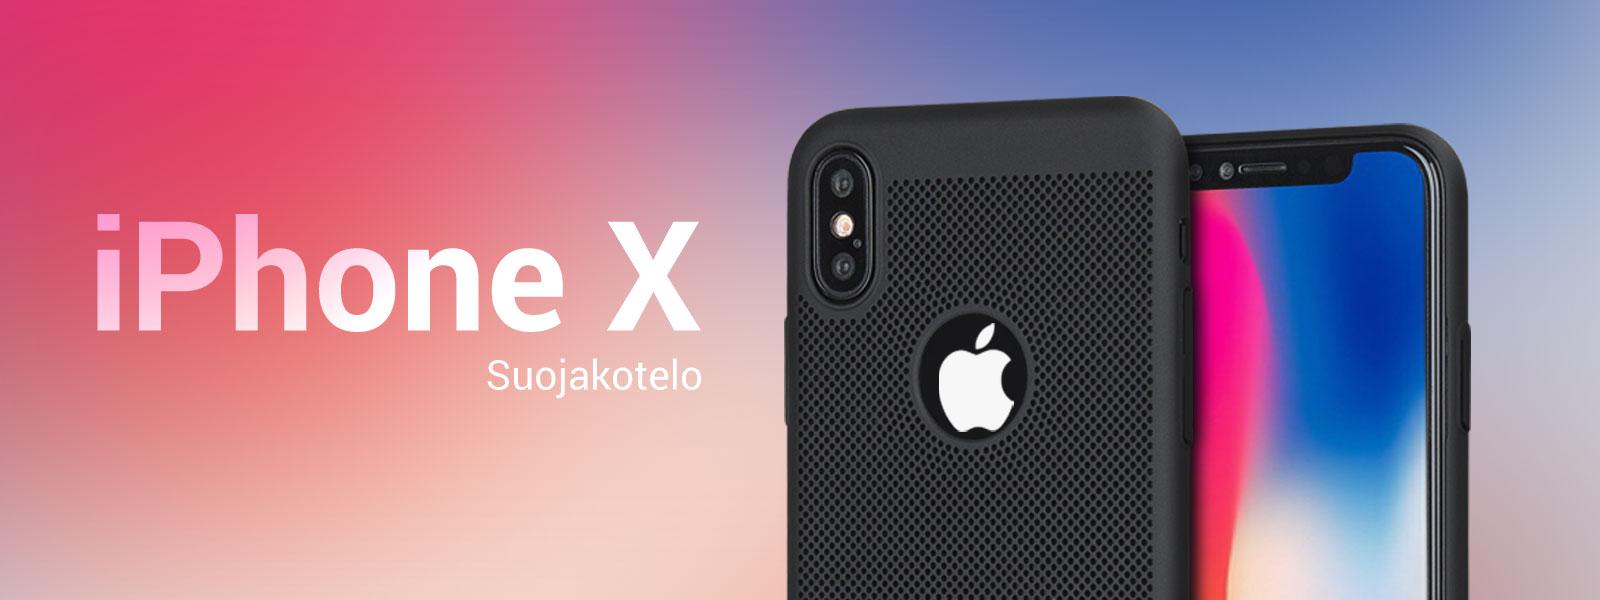 iPhone X suojakotelo - Find the best iPhone X suojakotelo